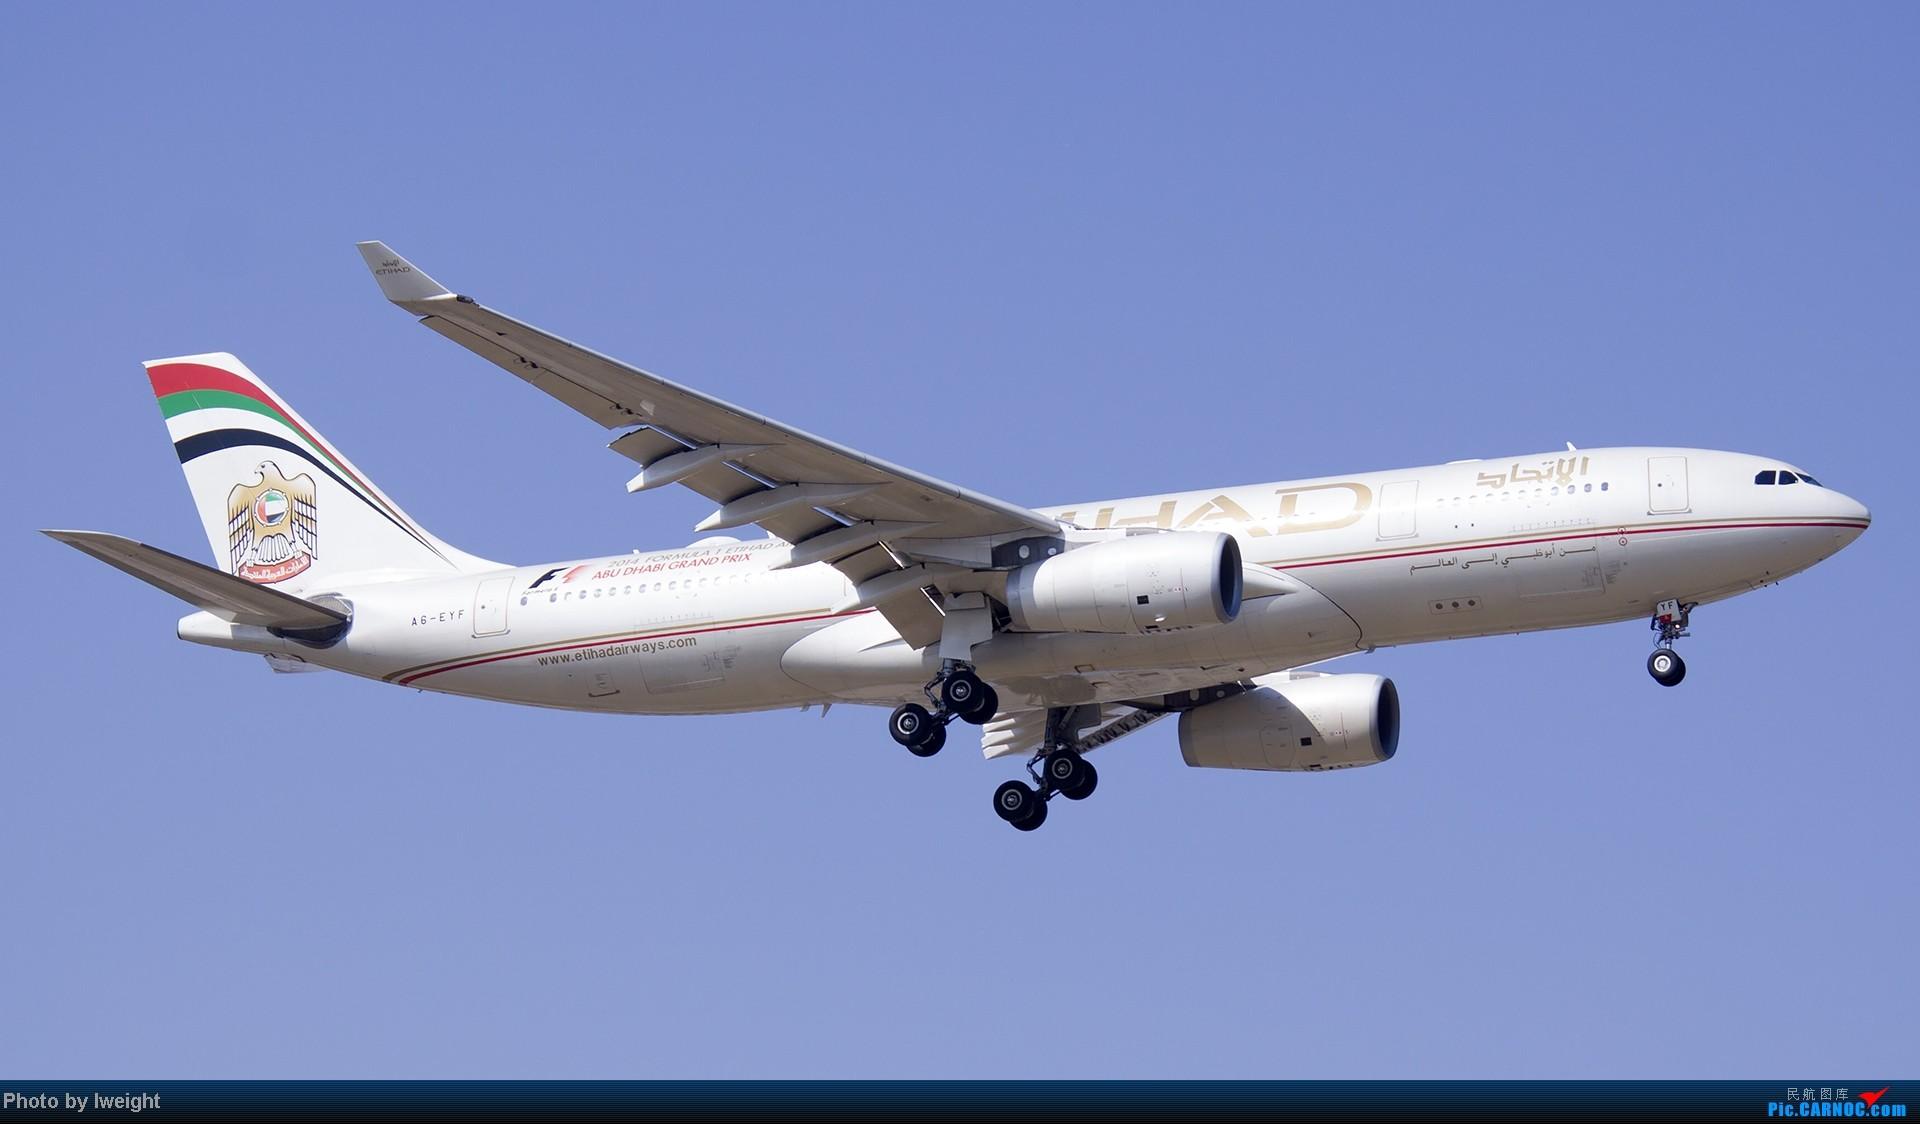 Re:[原创]北京难得的好天气,收获多种机型和彩绘,遗憾的是再次错过卡航巴塞罗那彩绘 AIRBUS A330-200 A6-EYF 中国北京首都机场